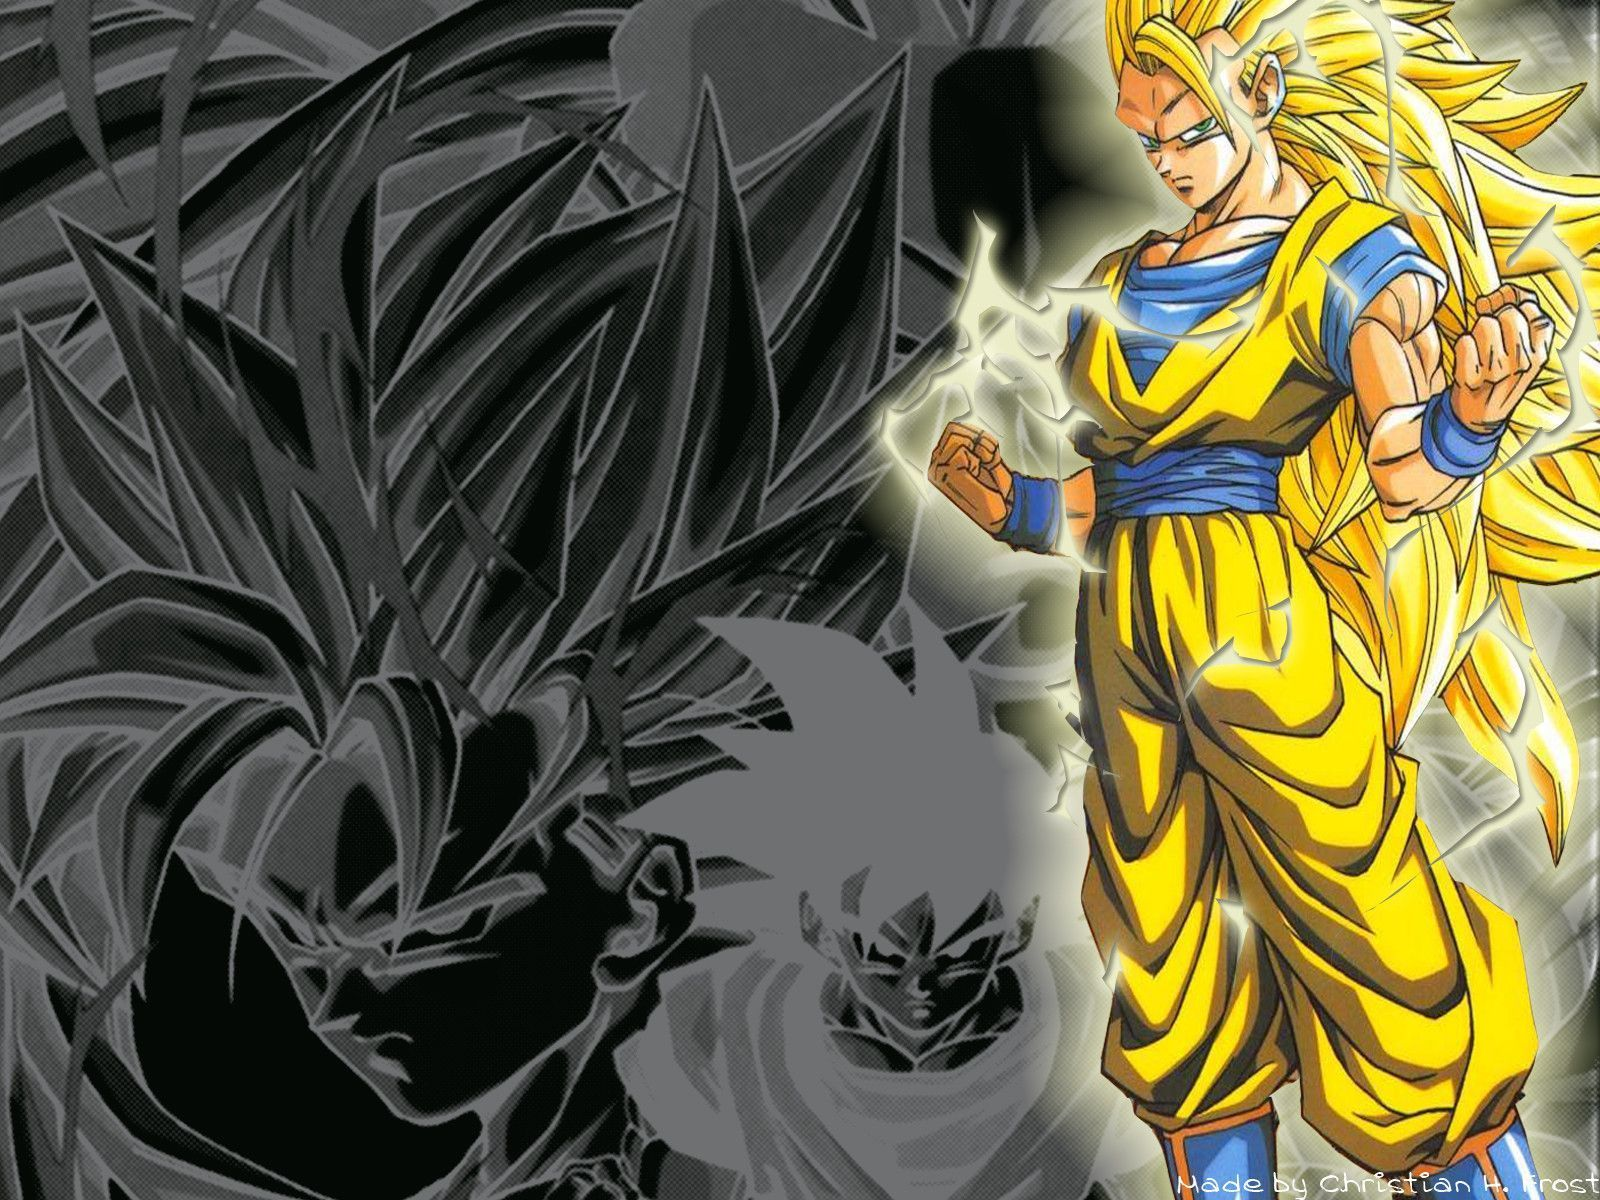 Google chrome themes dragon ball z - Dragon Ball Z Goku Wallpapers Wallpaper Cave